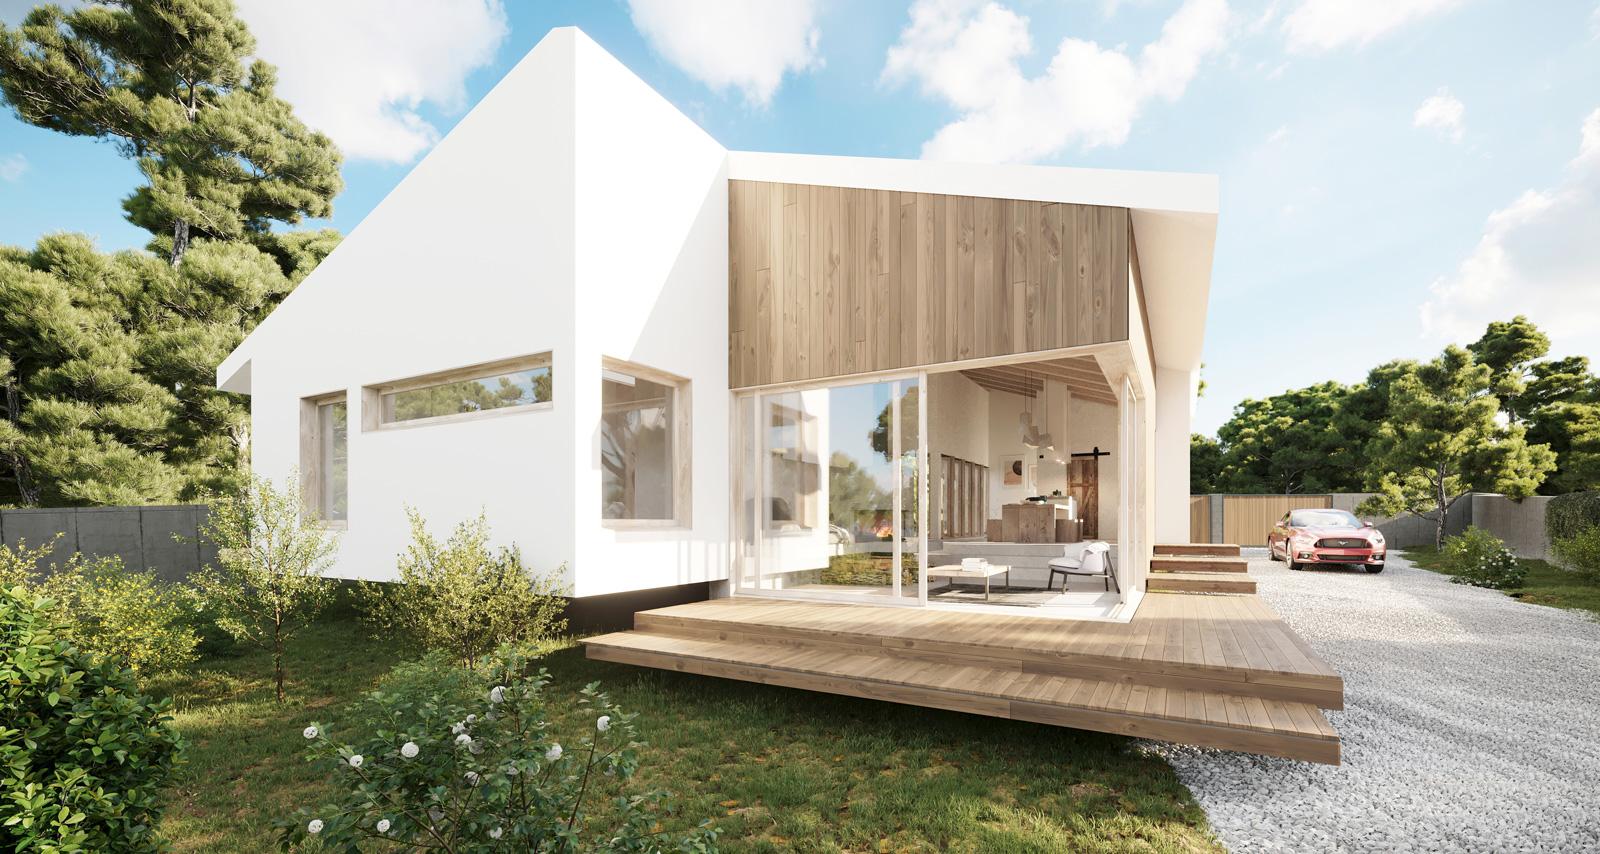 estudio de arquitectura en pola de lena